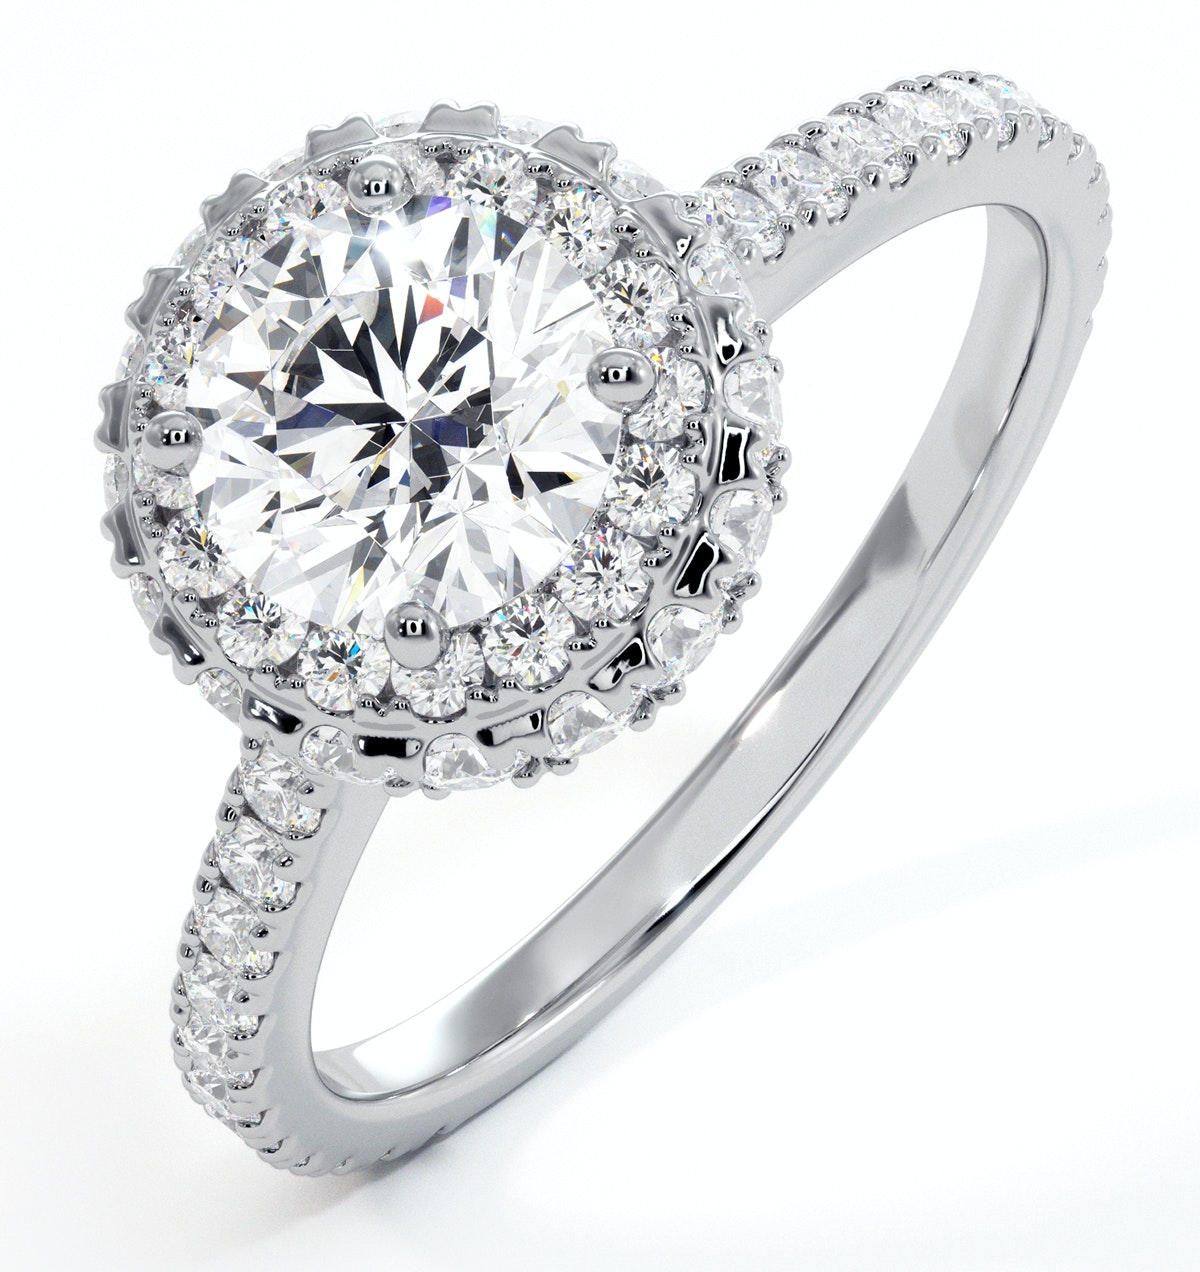 Valerie GIA Diamond Halo Engagement Ring 18K White Gold 1.60ct G/SI1